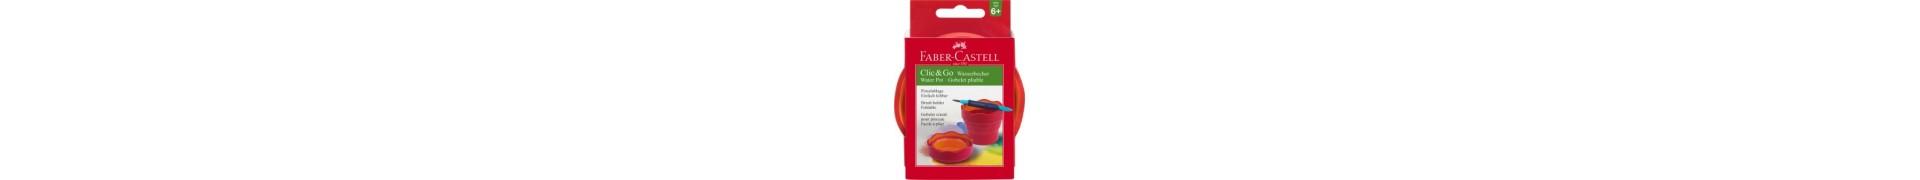 Gobelet à eau FABER & CASTELL - CLIC & GO - Baie